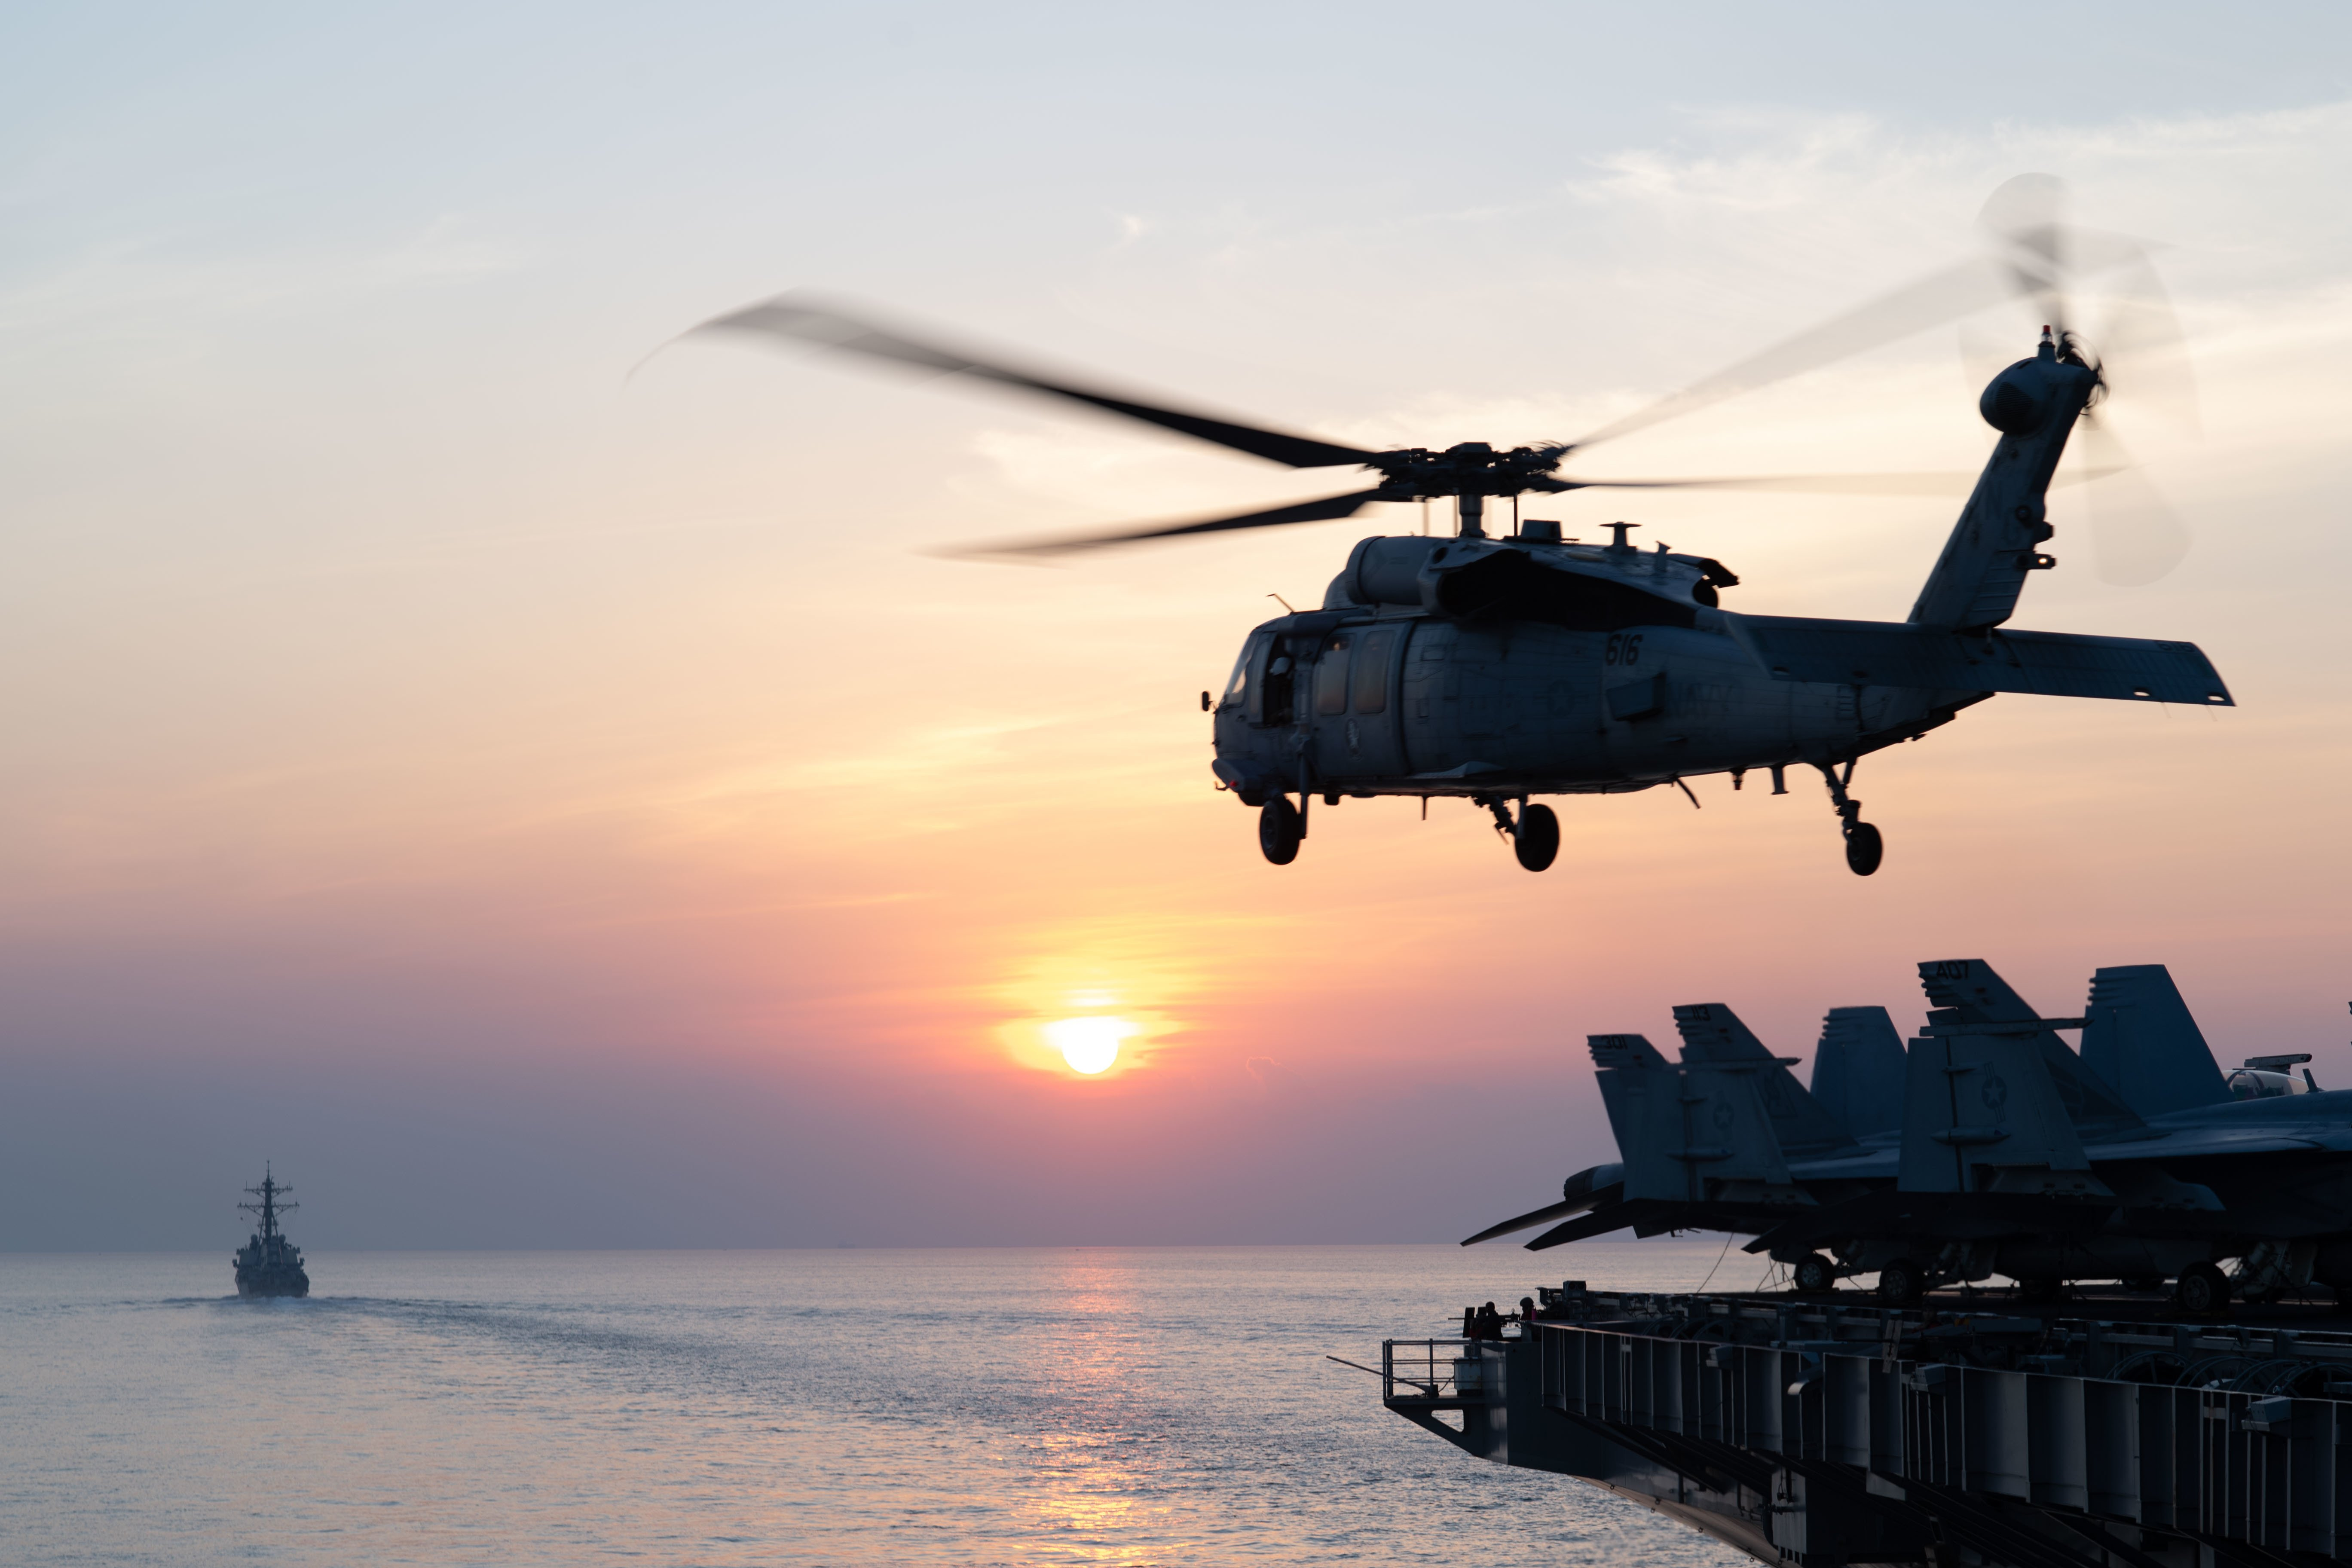 After Two Months, Carrier USS John C. Stennis Returns to Persian Gulf